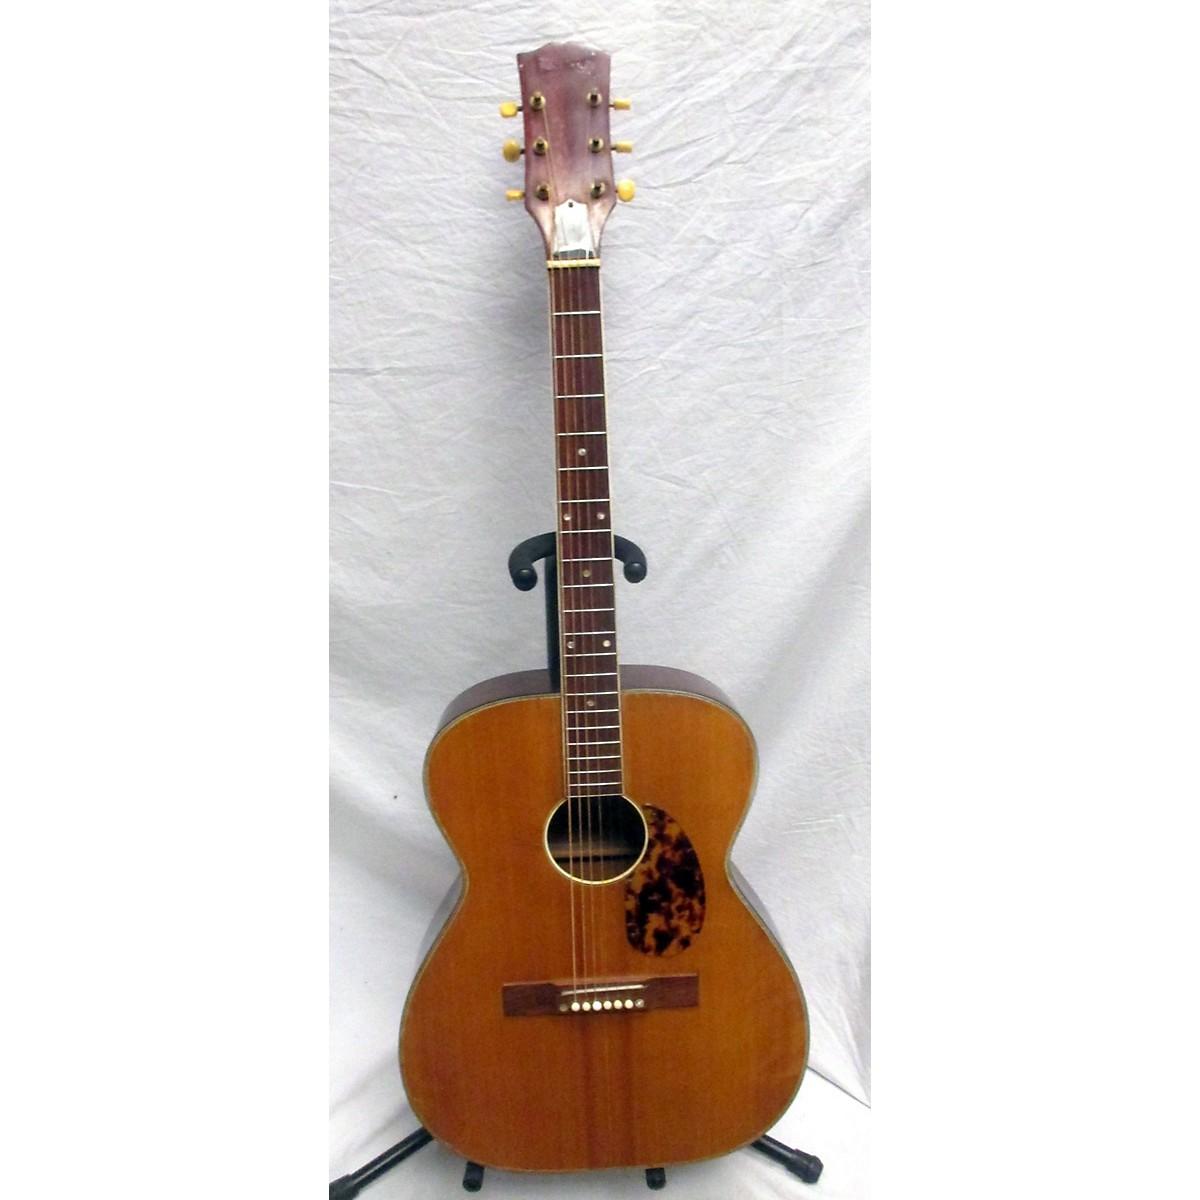 Vega 1970s Jumbo Acoustic Acoustic Guitar